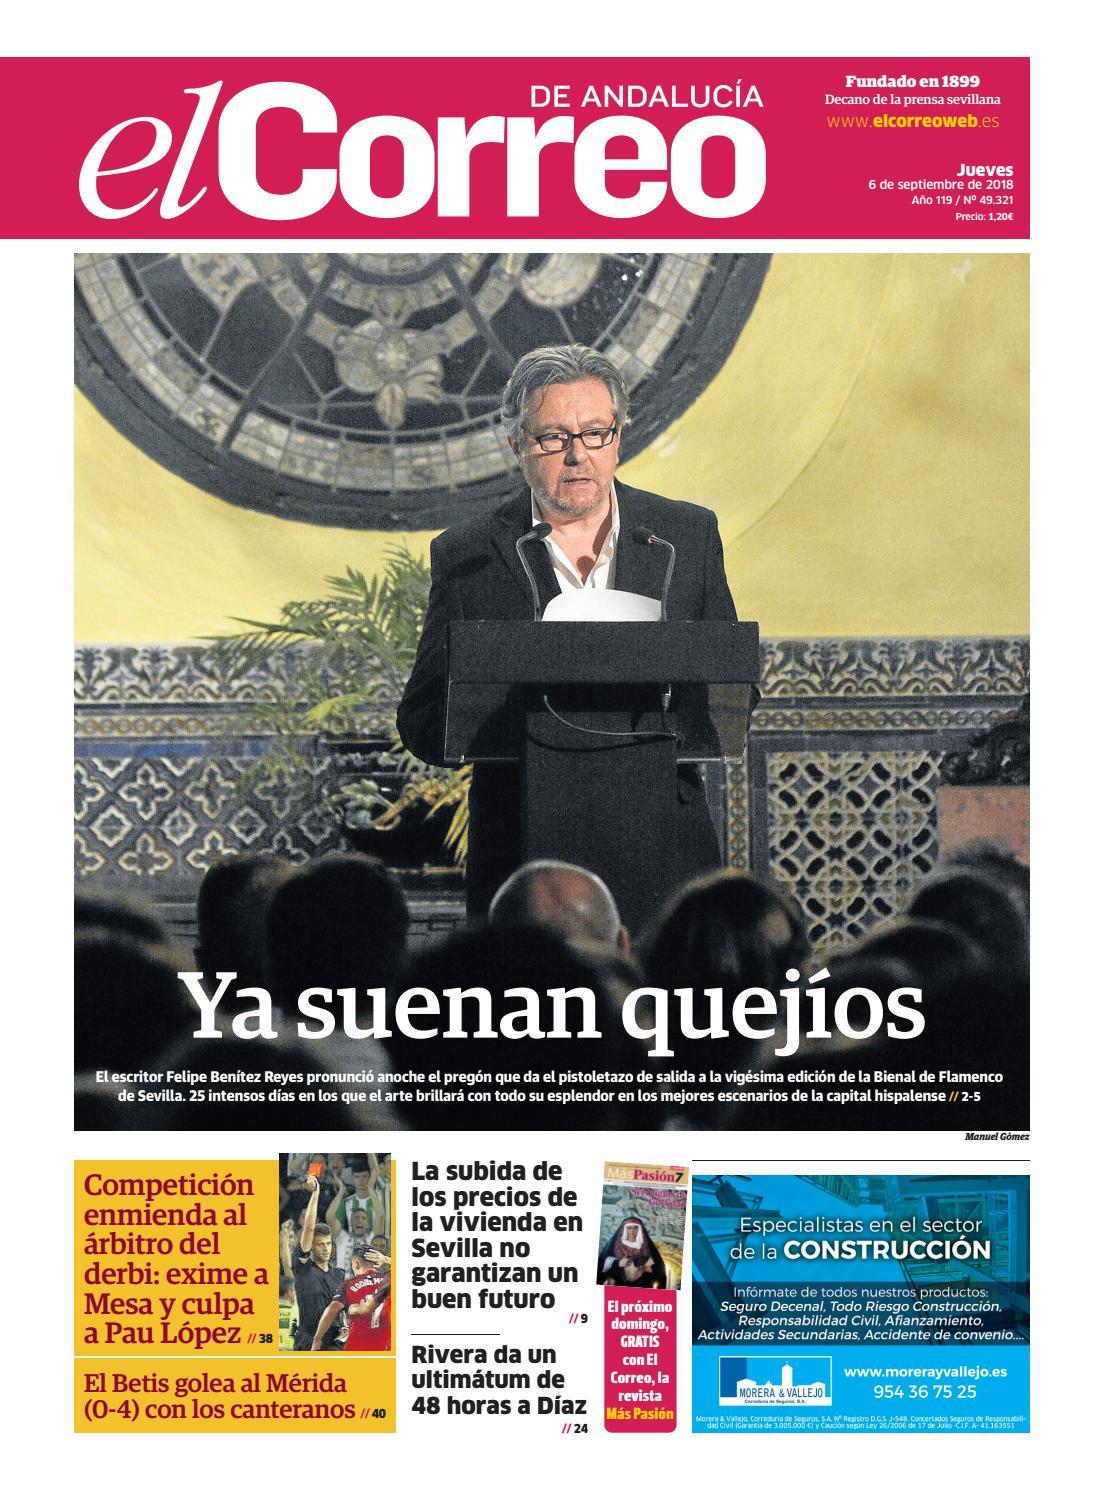 06.09.2018 El Correo de Andalucía by EL CORREO DE ANDALUCÍA S.L. - issuu 16a9f87ba6b